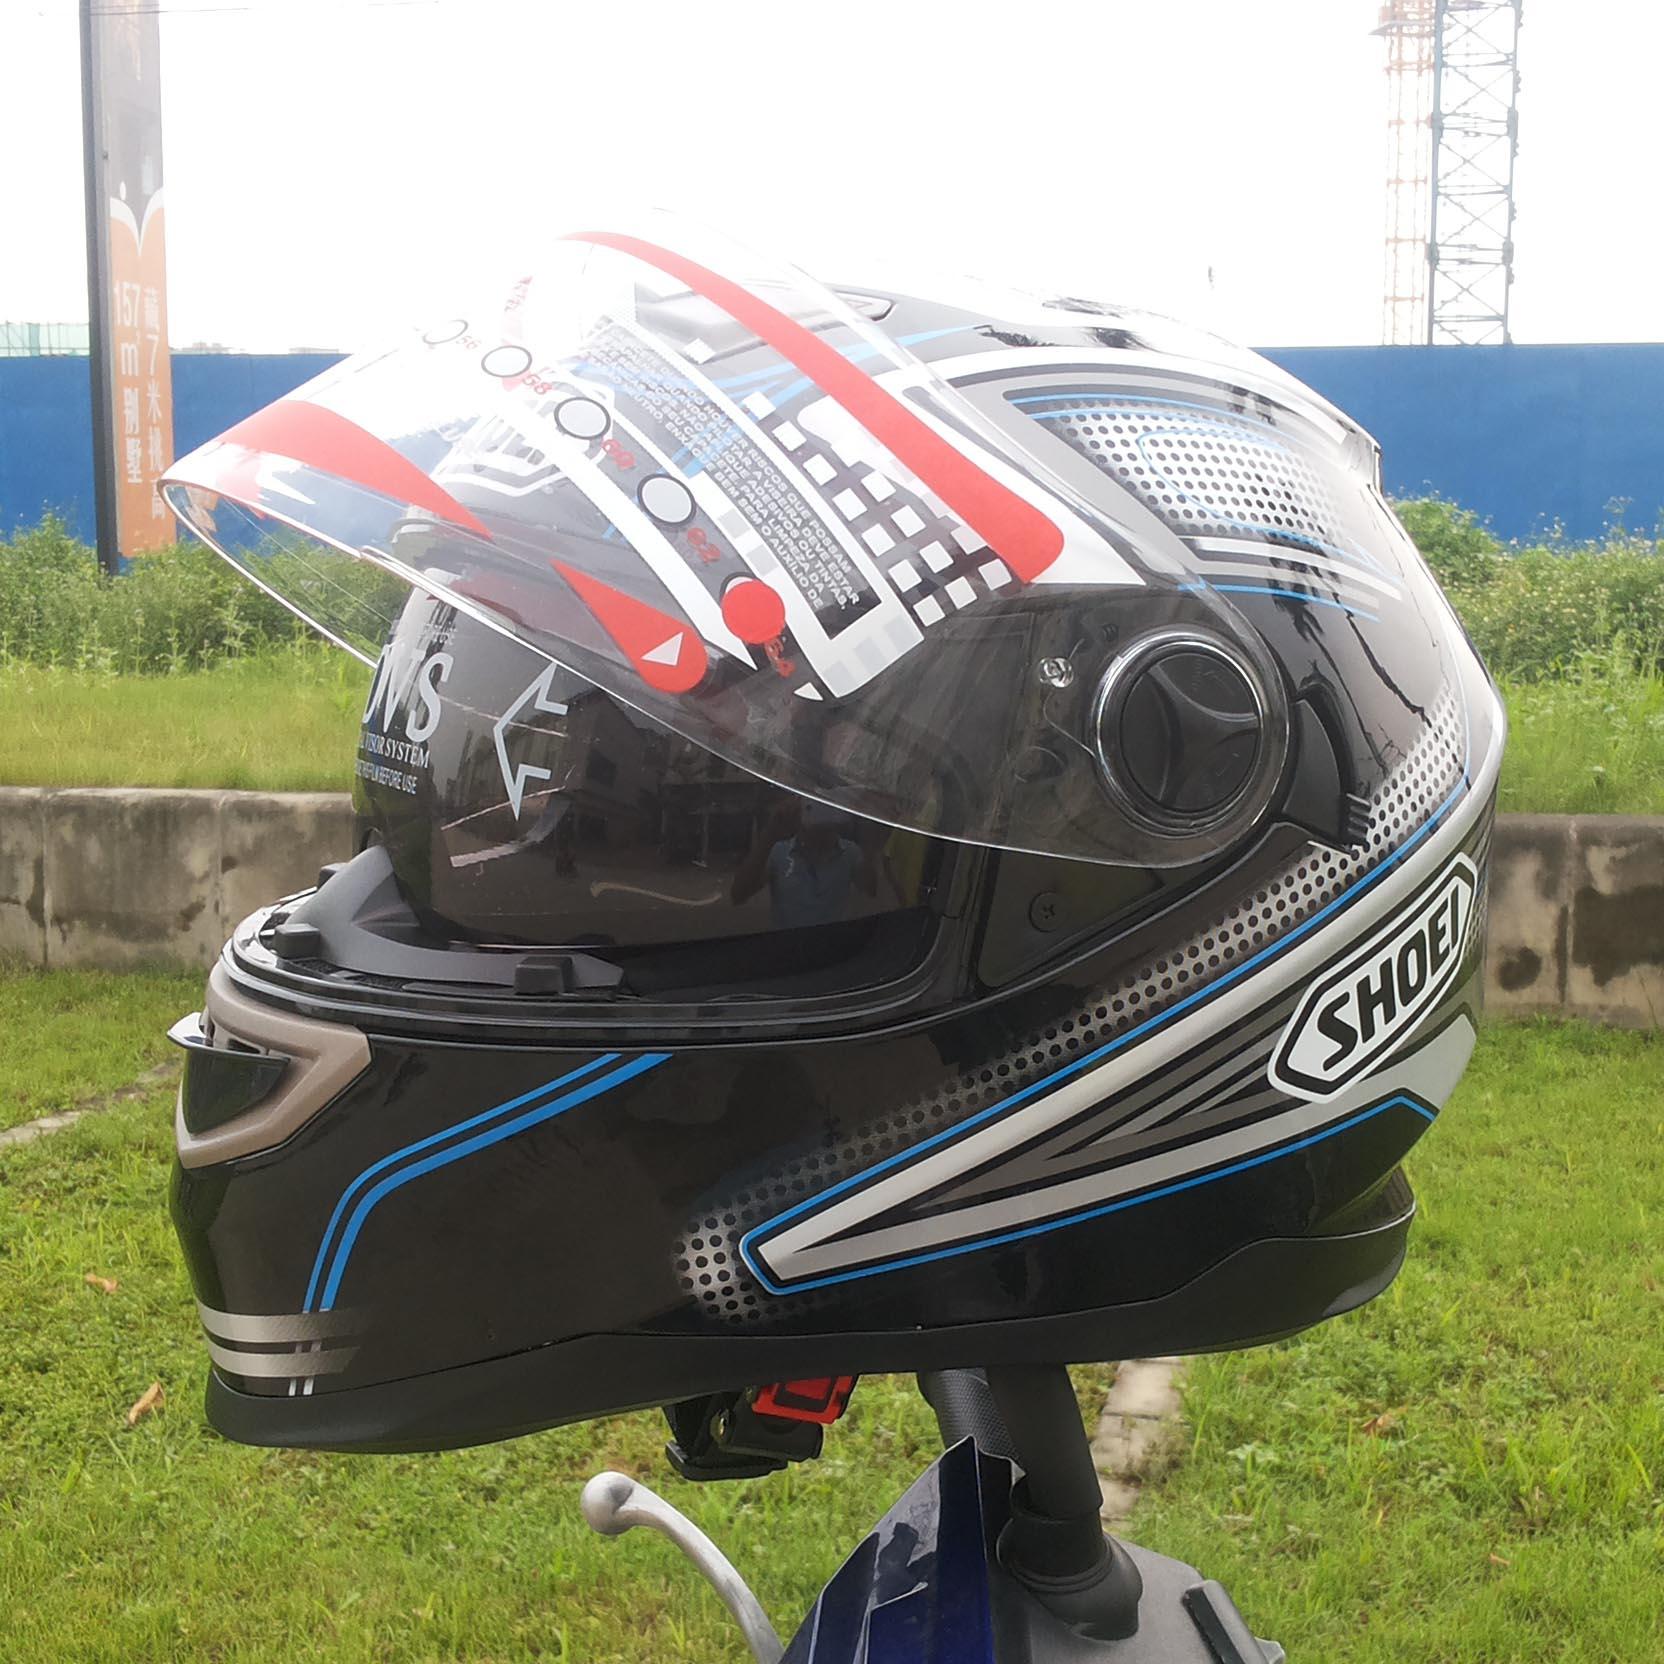 Shoei mens motorcycle helmets motocross racing helmet off road motorbike full face moto cross helmet dual shield(China (Mainland))